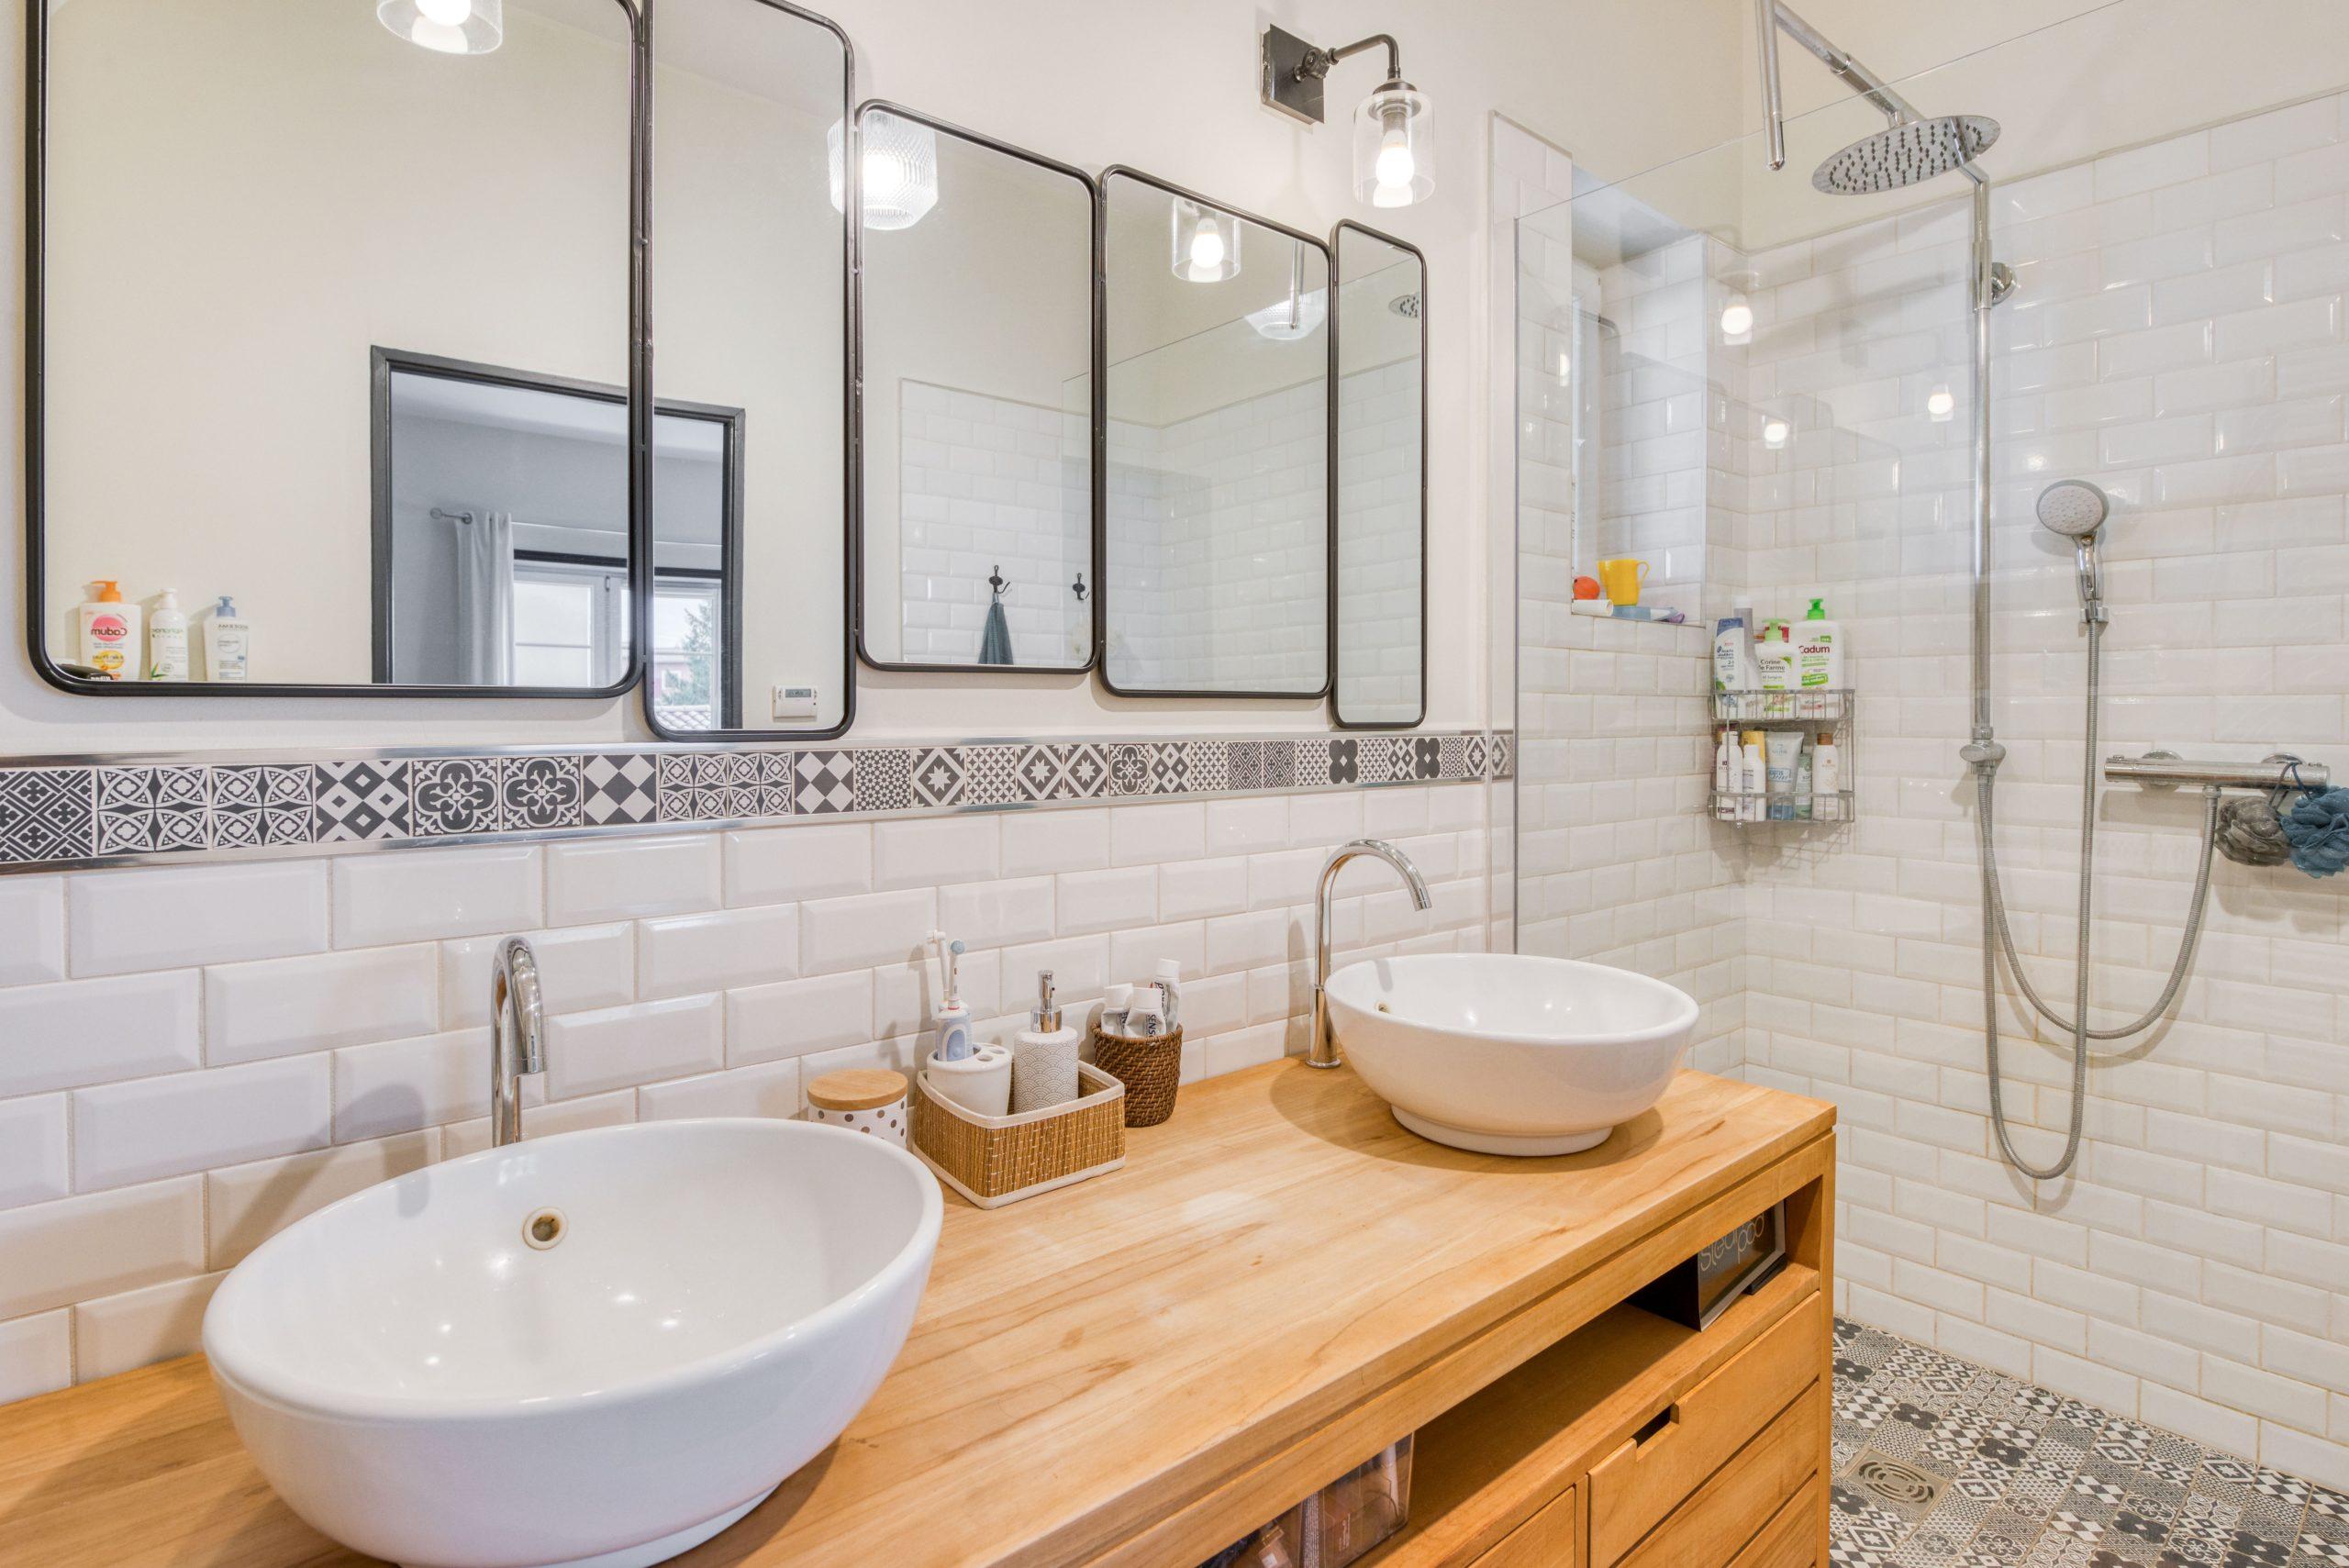 Amazing Designers to transform your bathroom in LYON amazing designers to transform your bathroom in lyon Amazing Designers to transform your bathroom in LYON Meero photo 37125002 034 scaled 1